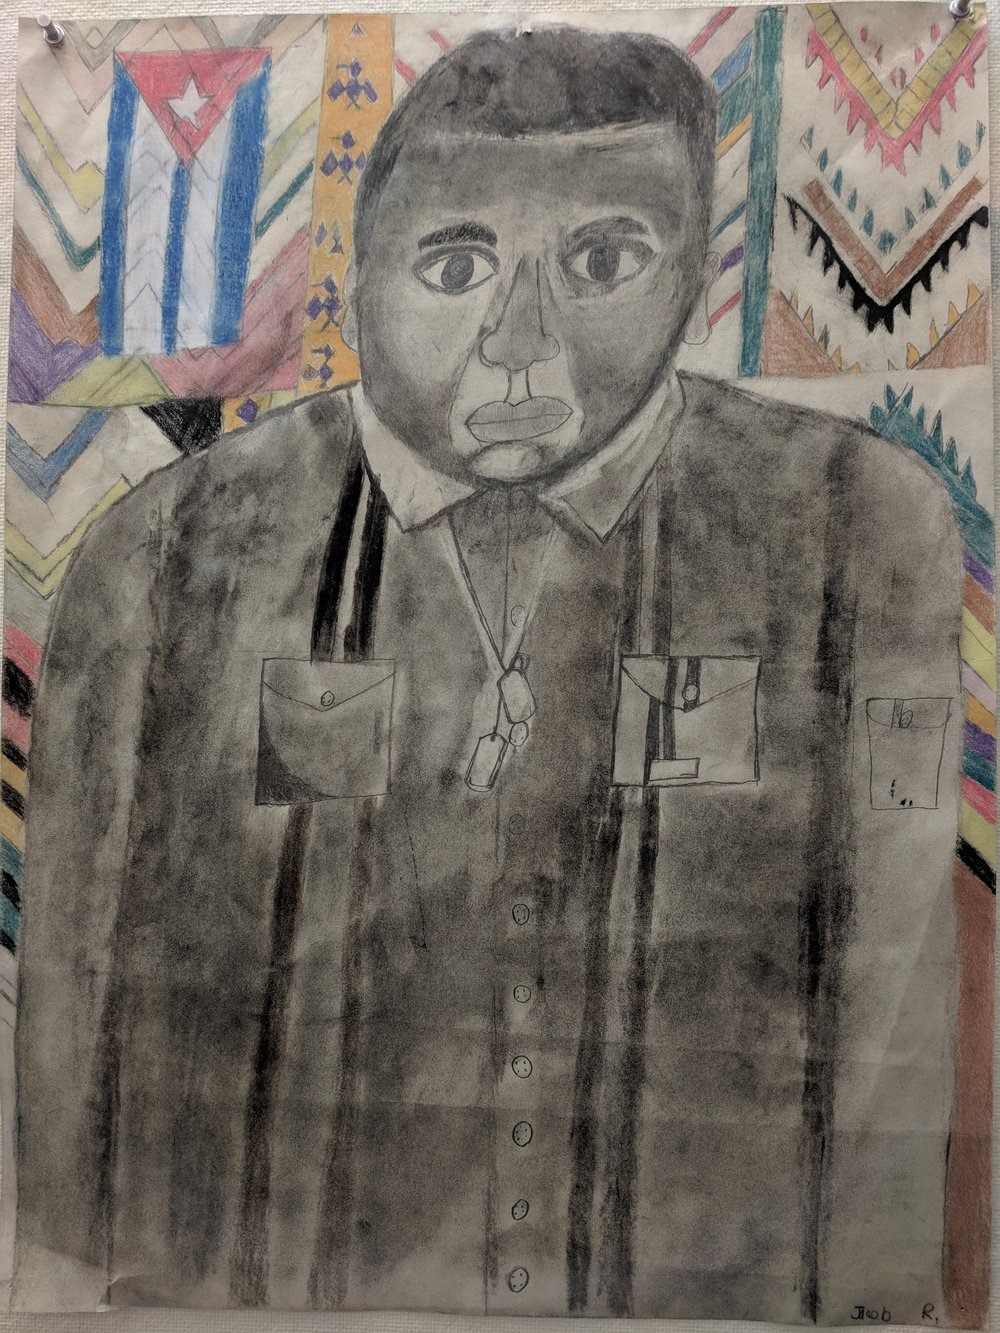 Jacob's Sankofa Self-Portrait